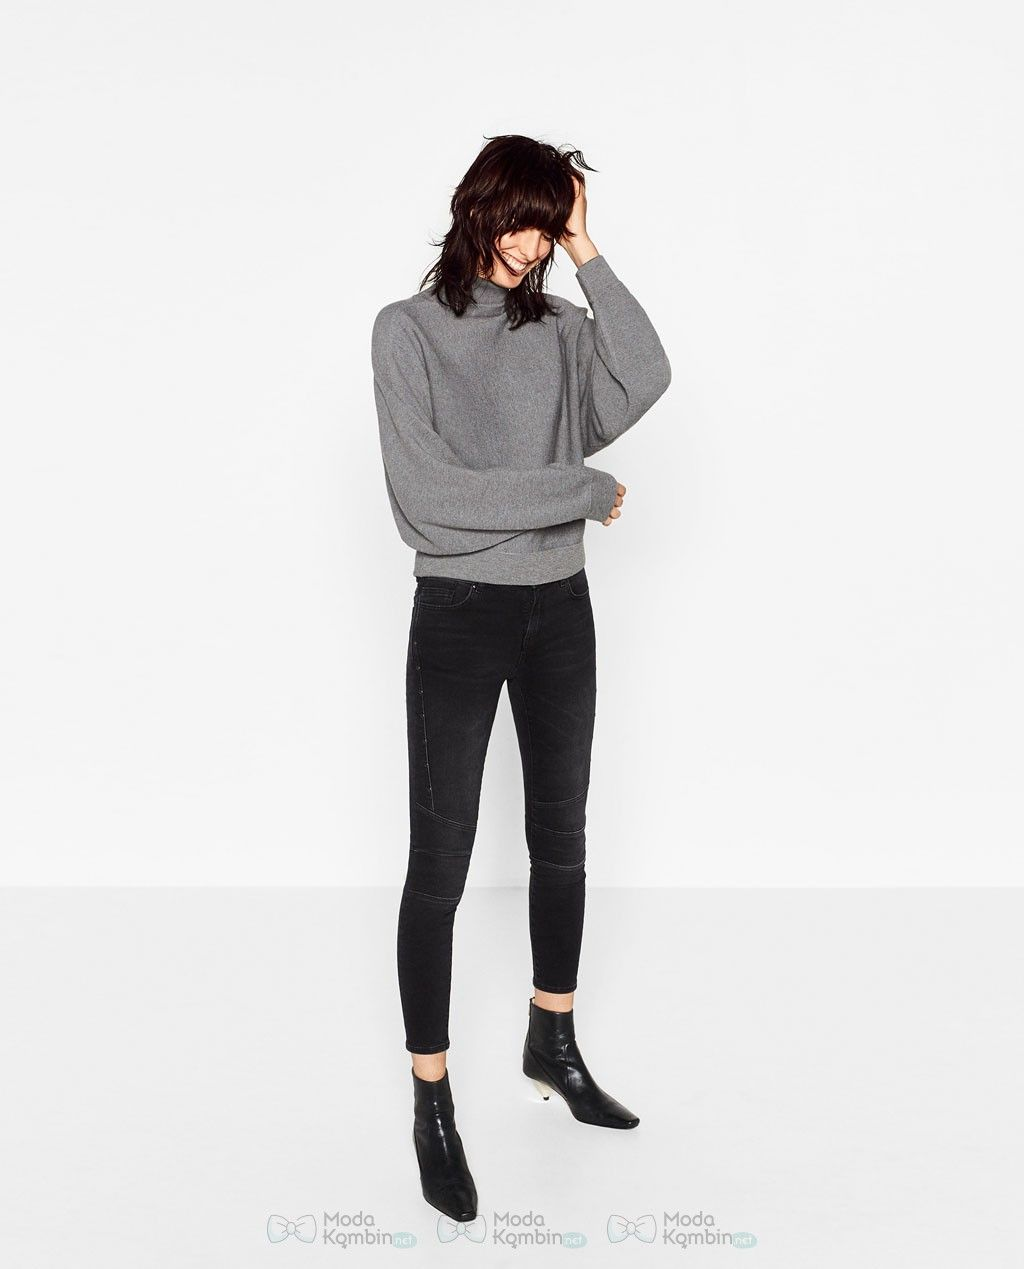 2017 Zara Bayan Jean Pantolon Modelleri 2017zarabayanjeanpantolonmodelleri 2017zarajeanpantolonmodasi Zara Moda Stilleri Kumas Pantolonlar